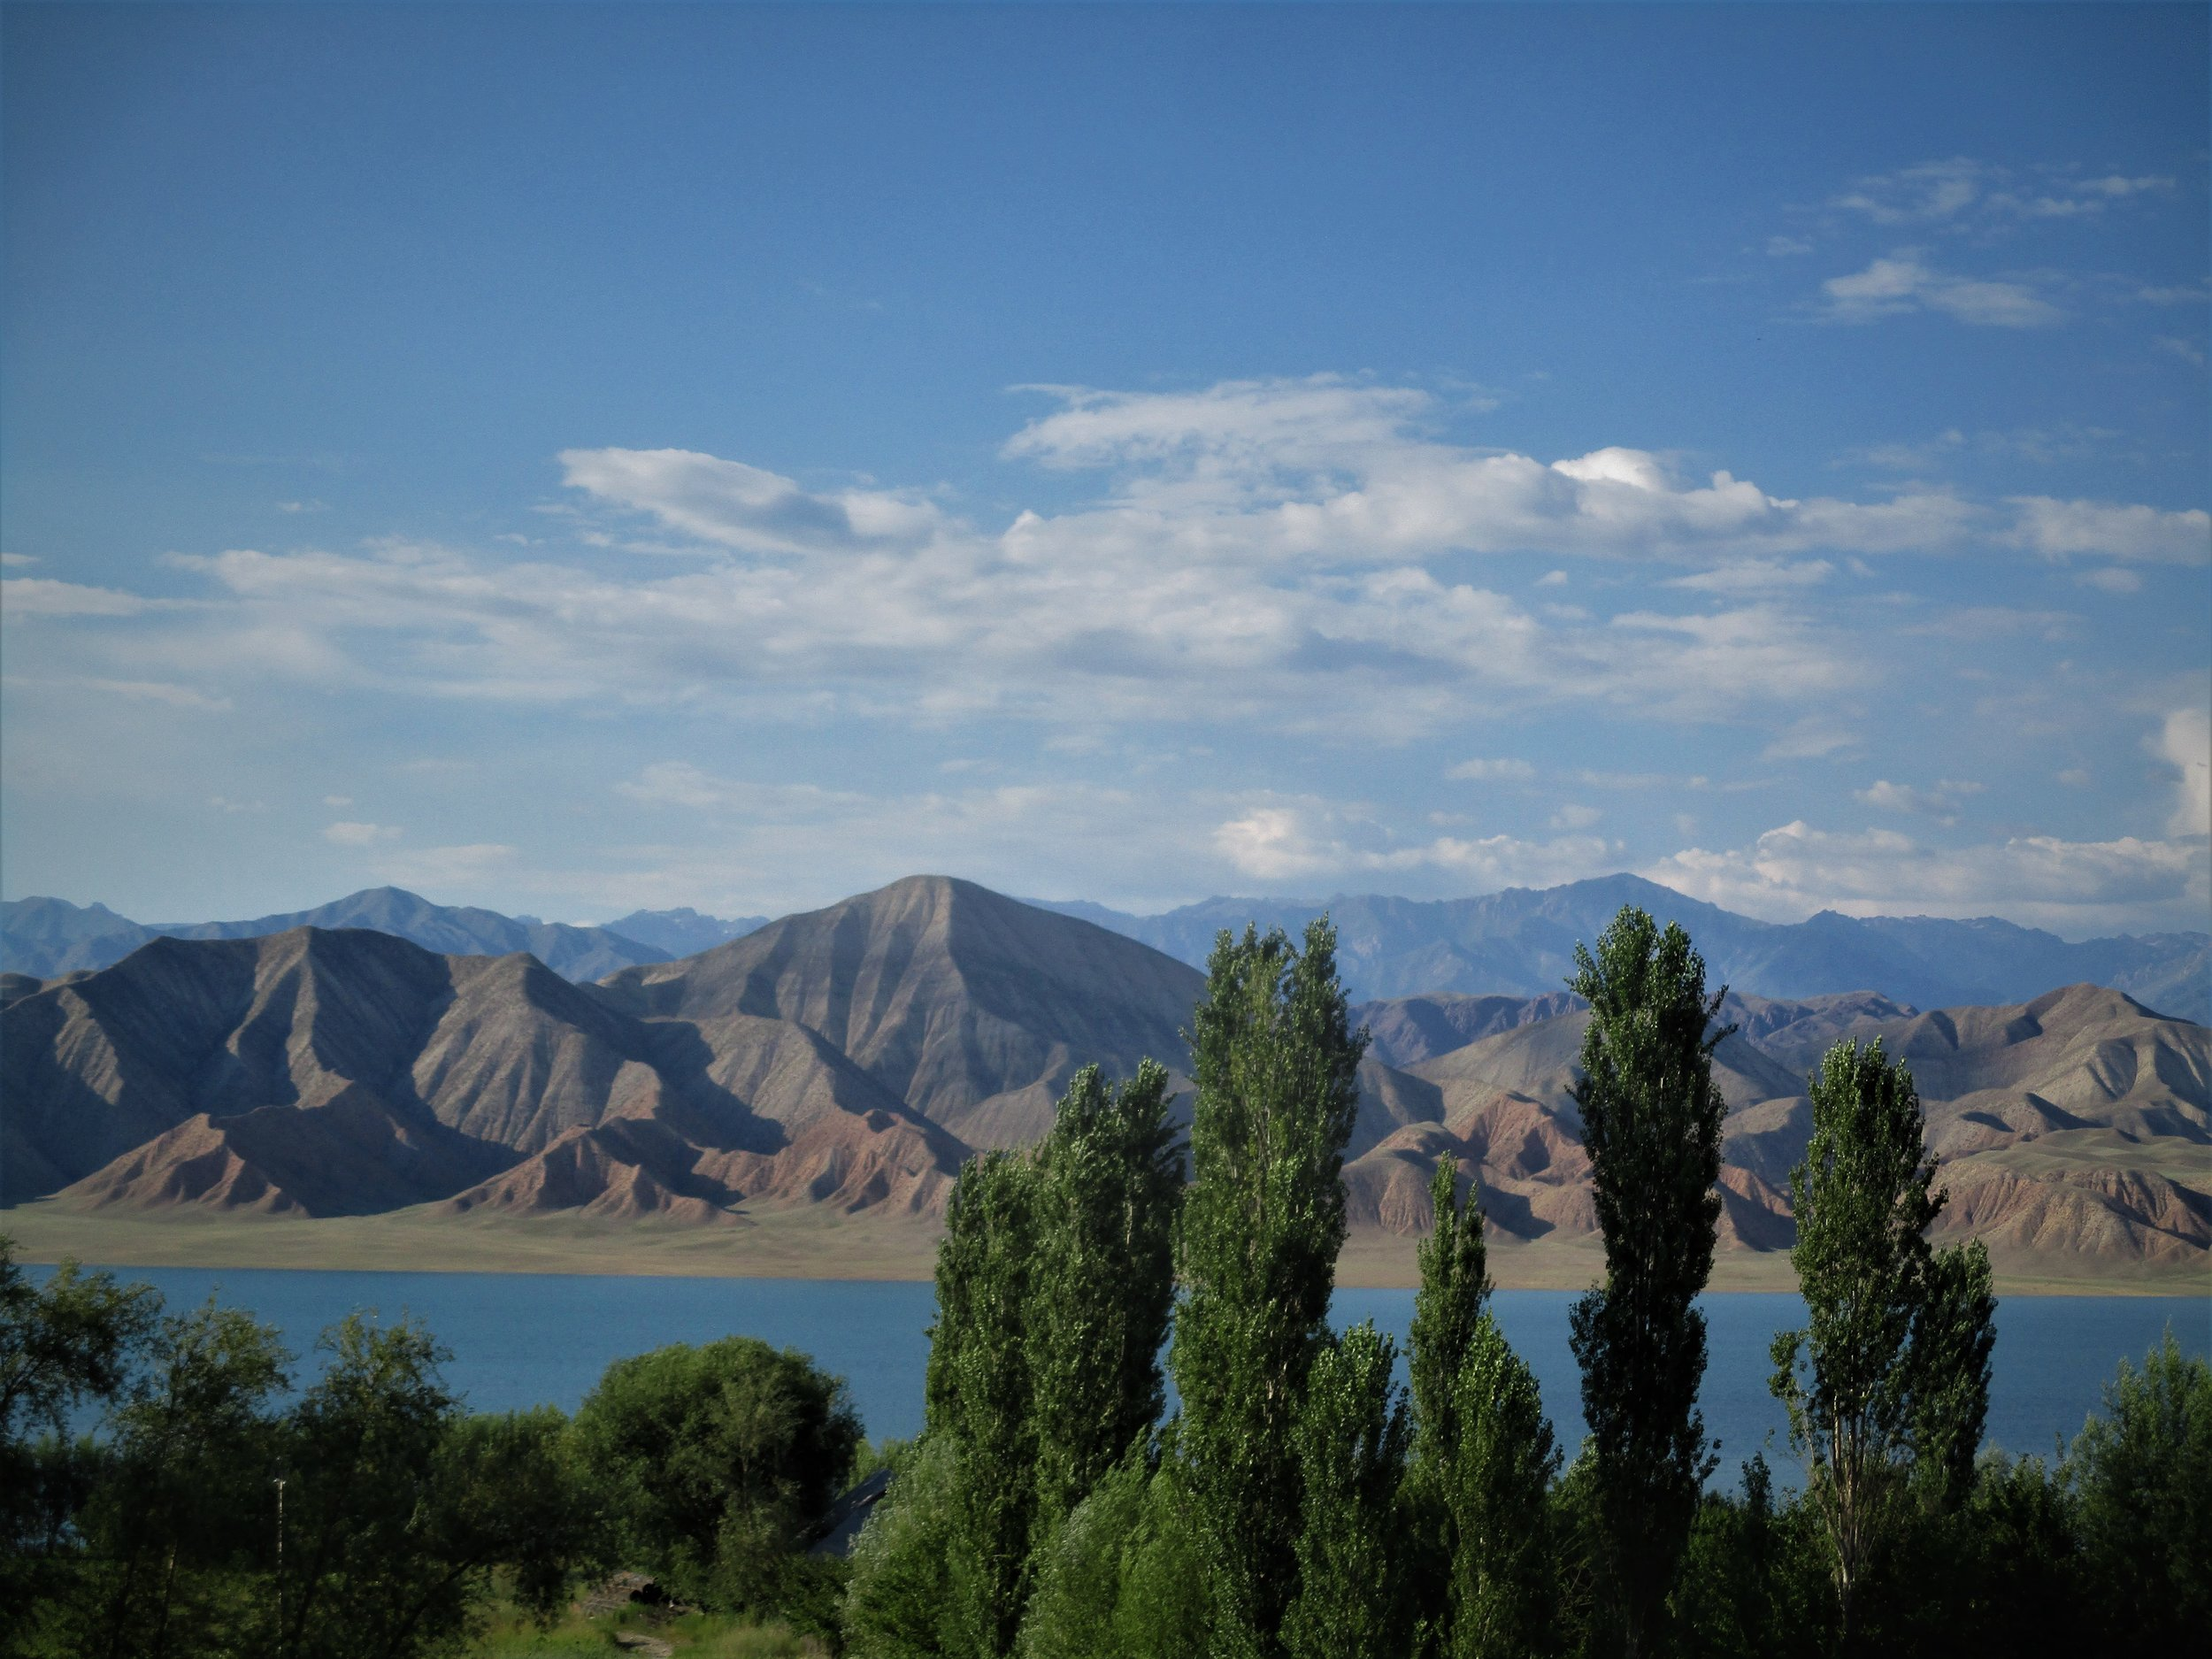 and finally lakes